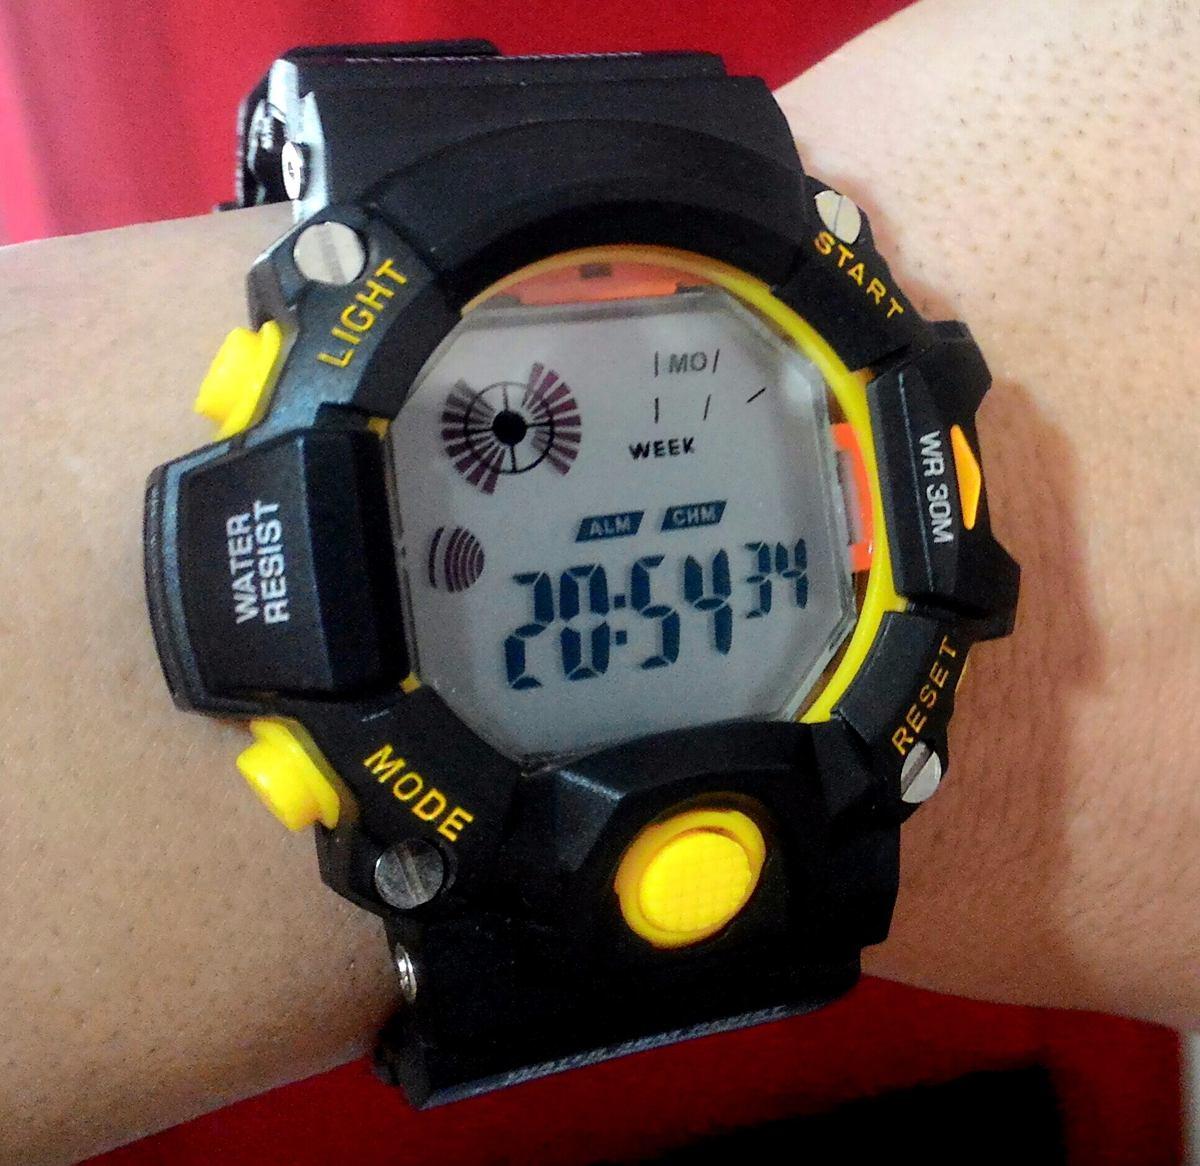 b309355f178 relógio esportivo masculino digital fashion sem logo - black. Carregando  zoom.